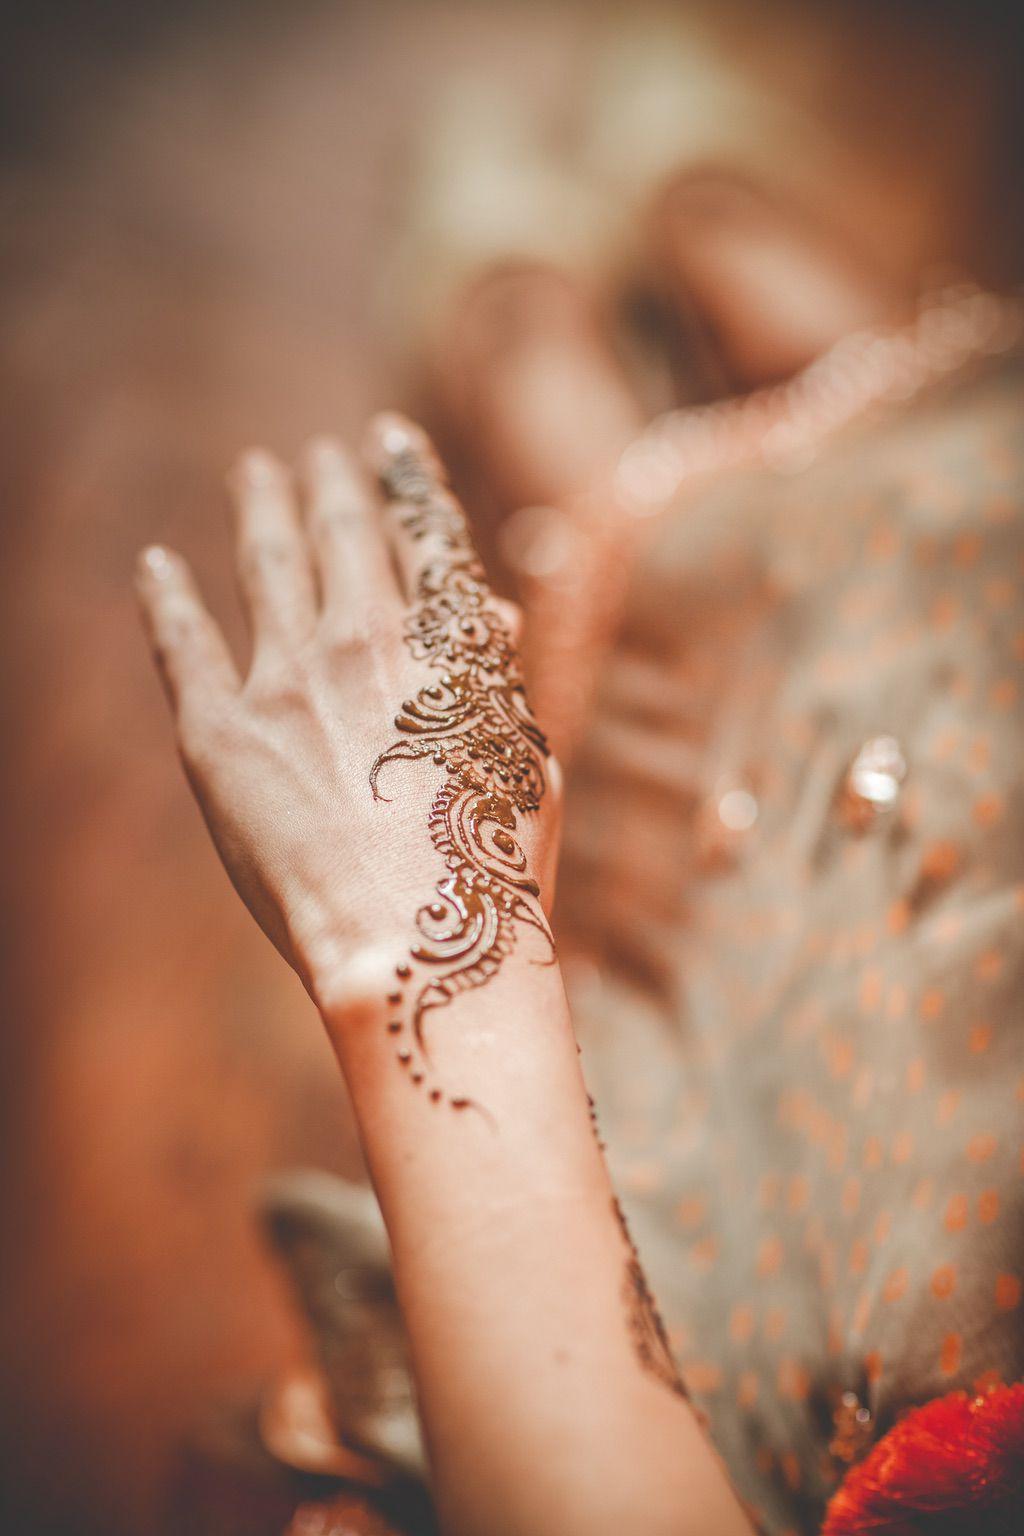 henna-hand-painting-pakistani-wedding-002